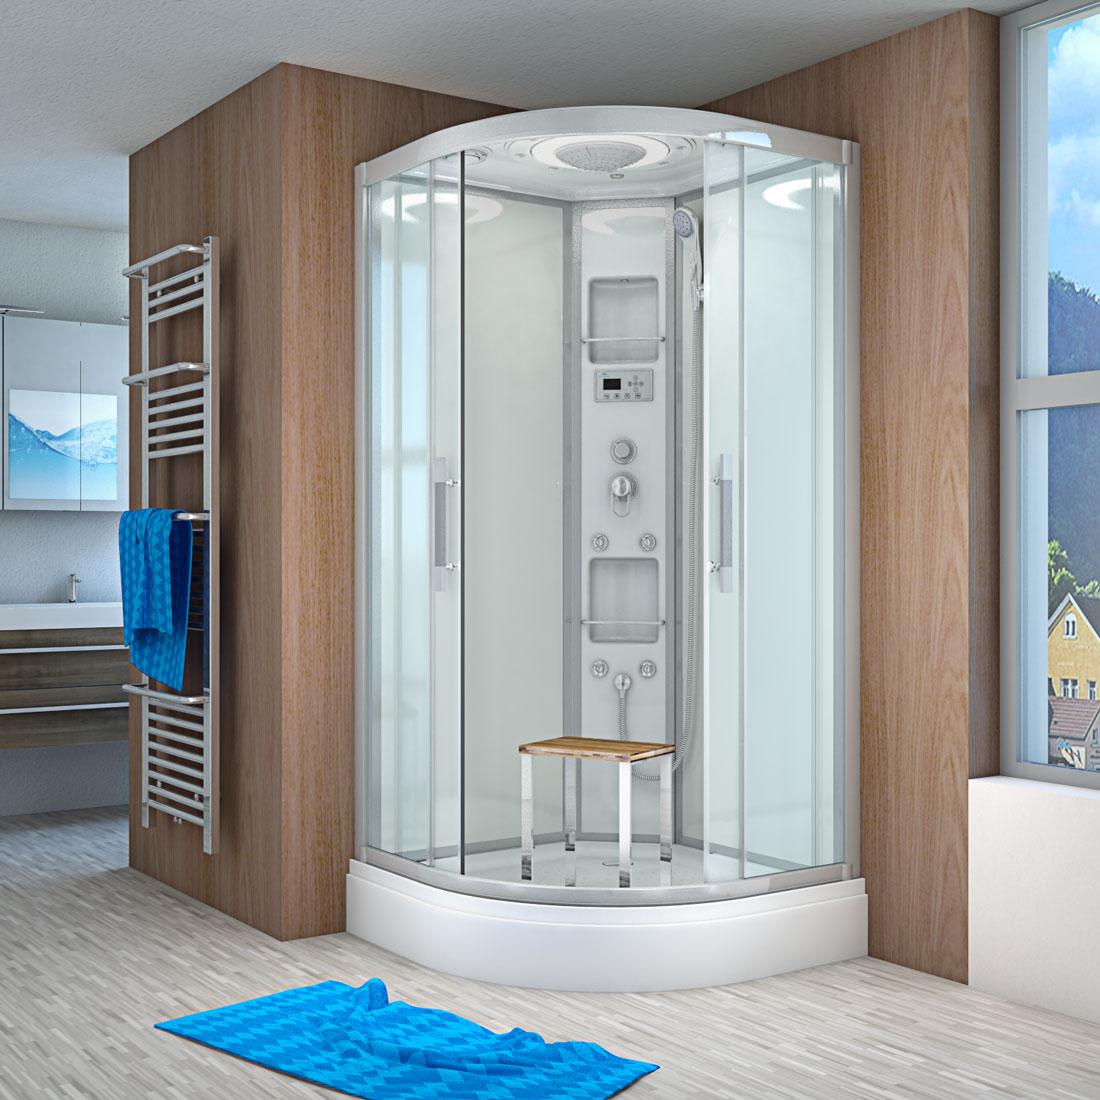 acquavapore quick26 1004 ws dusche 90x90cm. Black Bedroom Furniture Sets. Home Design Ideas